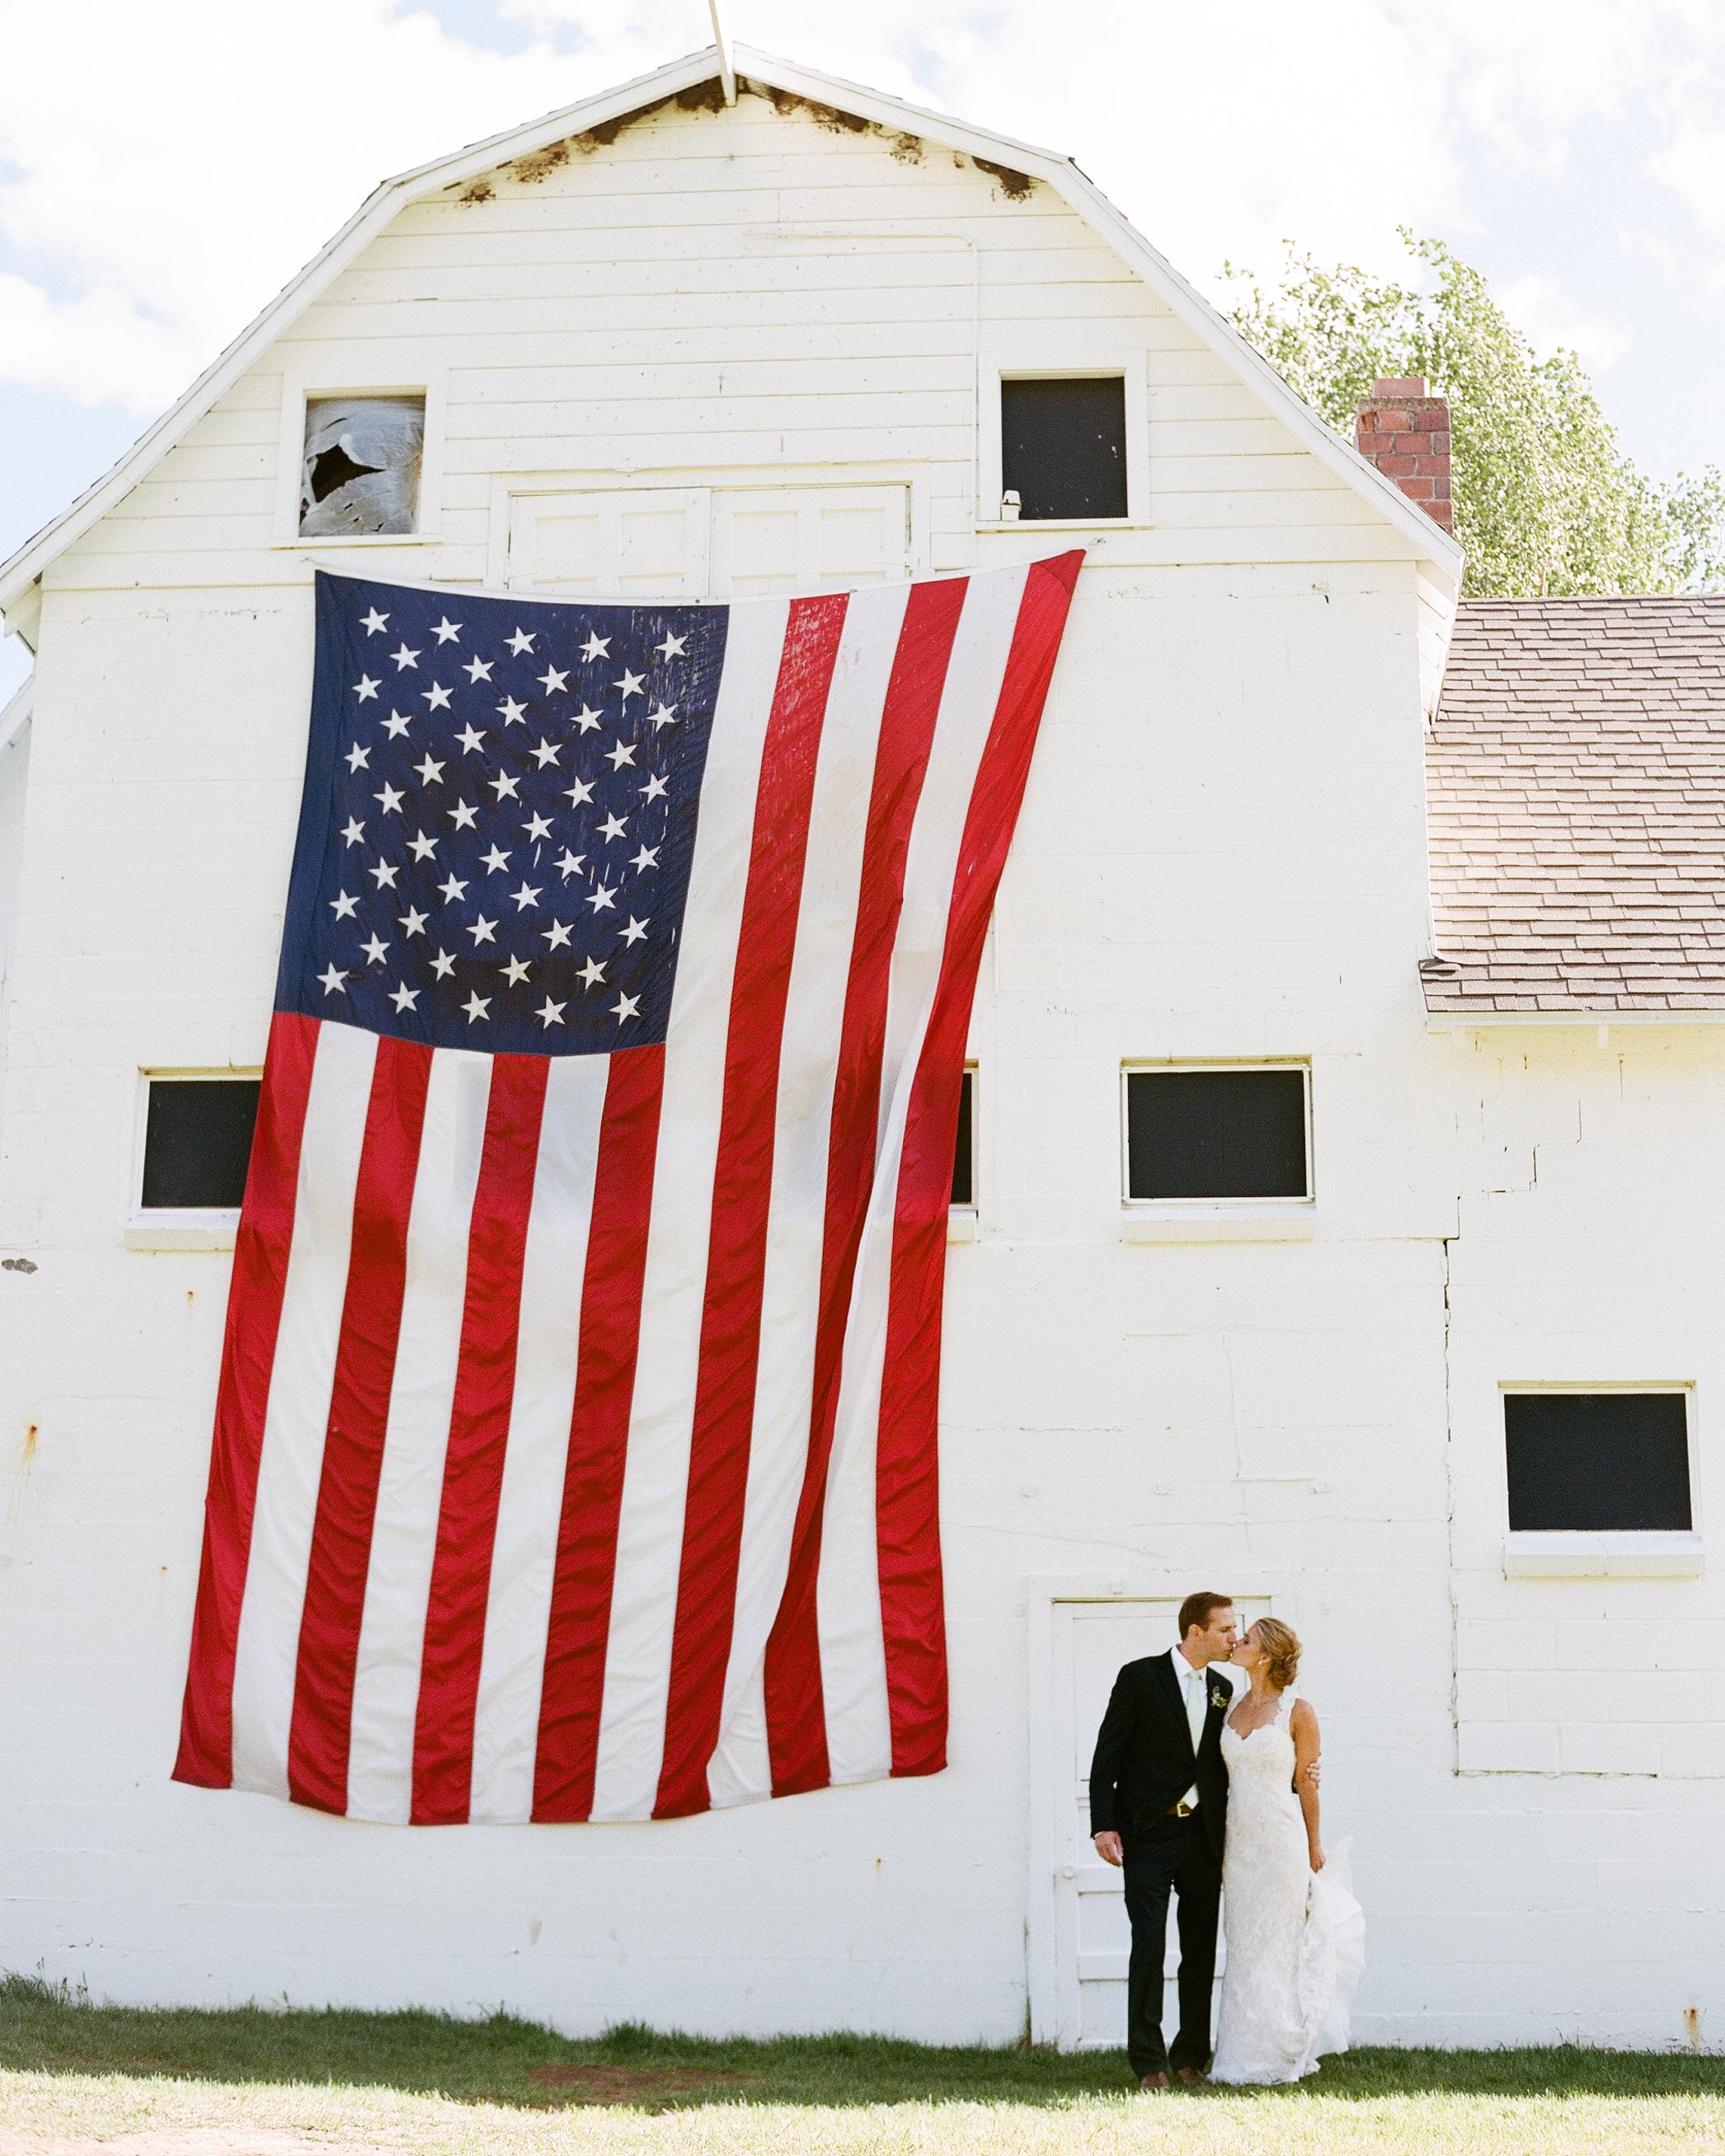 jamie-alex-wedding-flag-180-s111544-1014.jpg